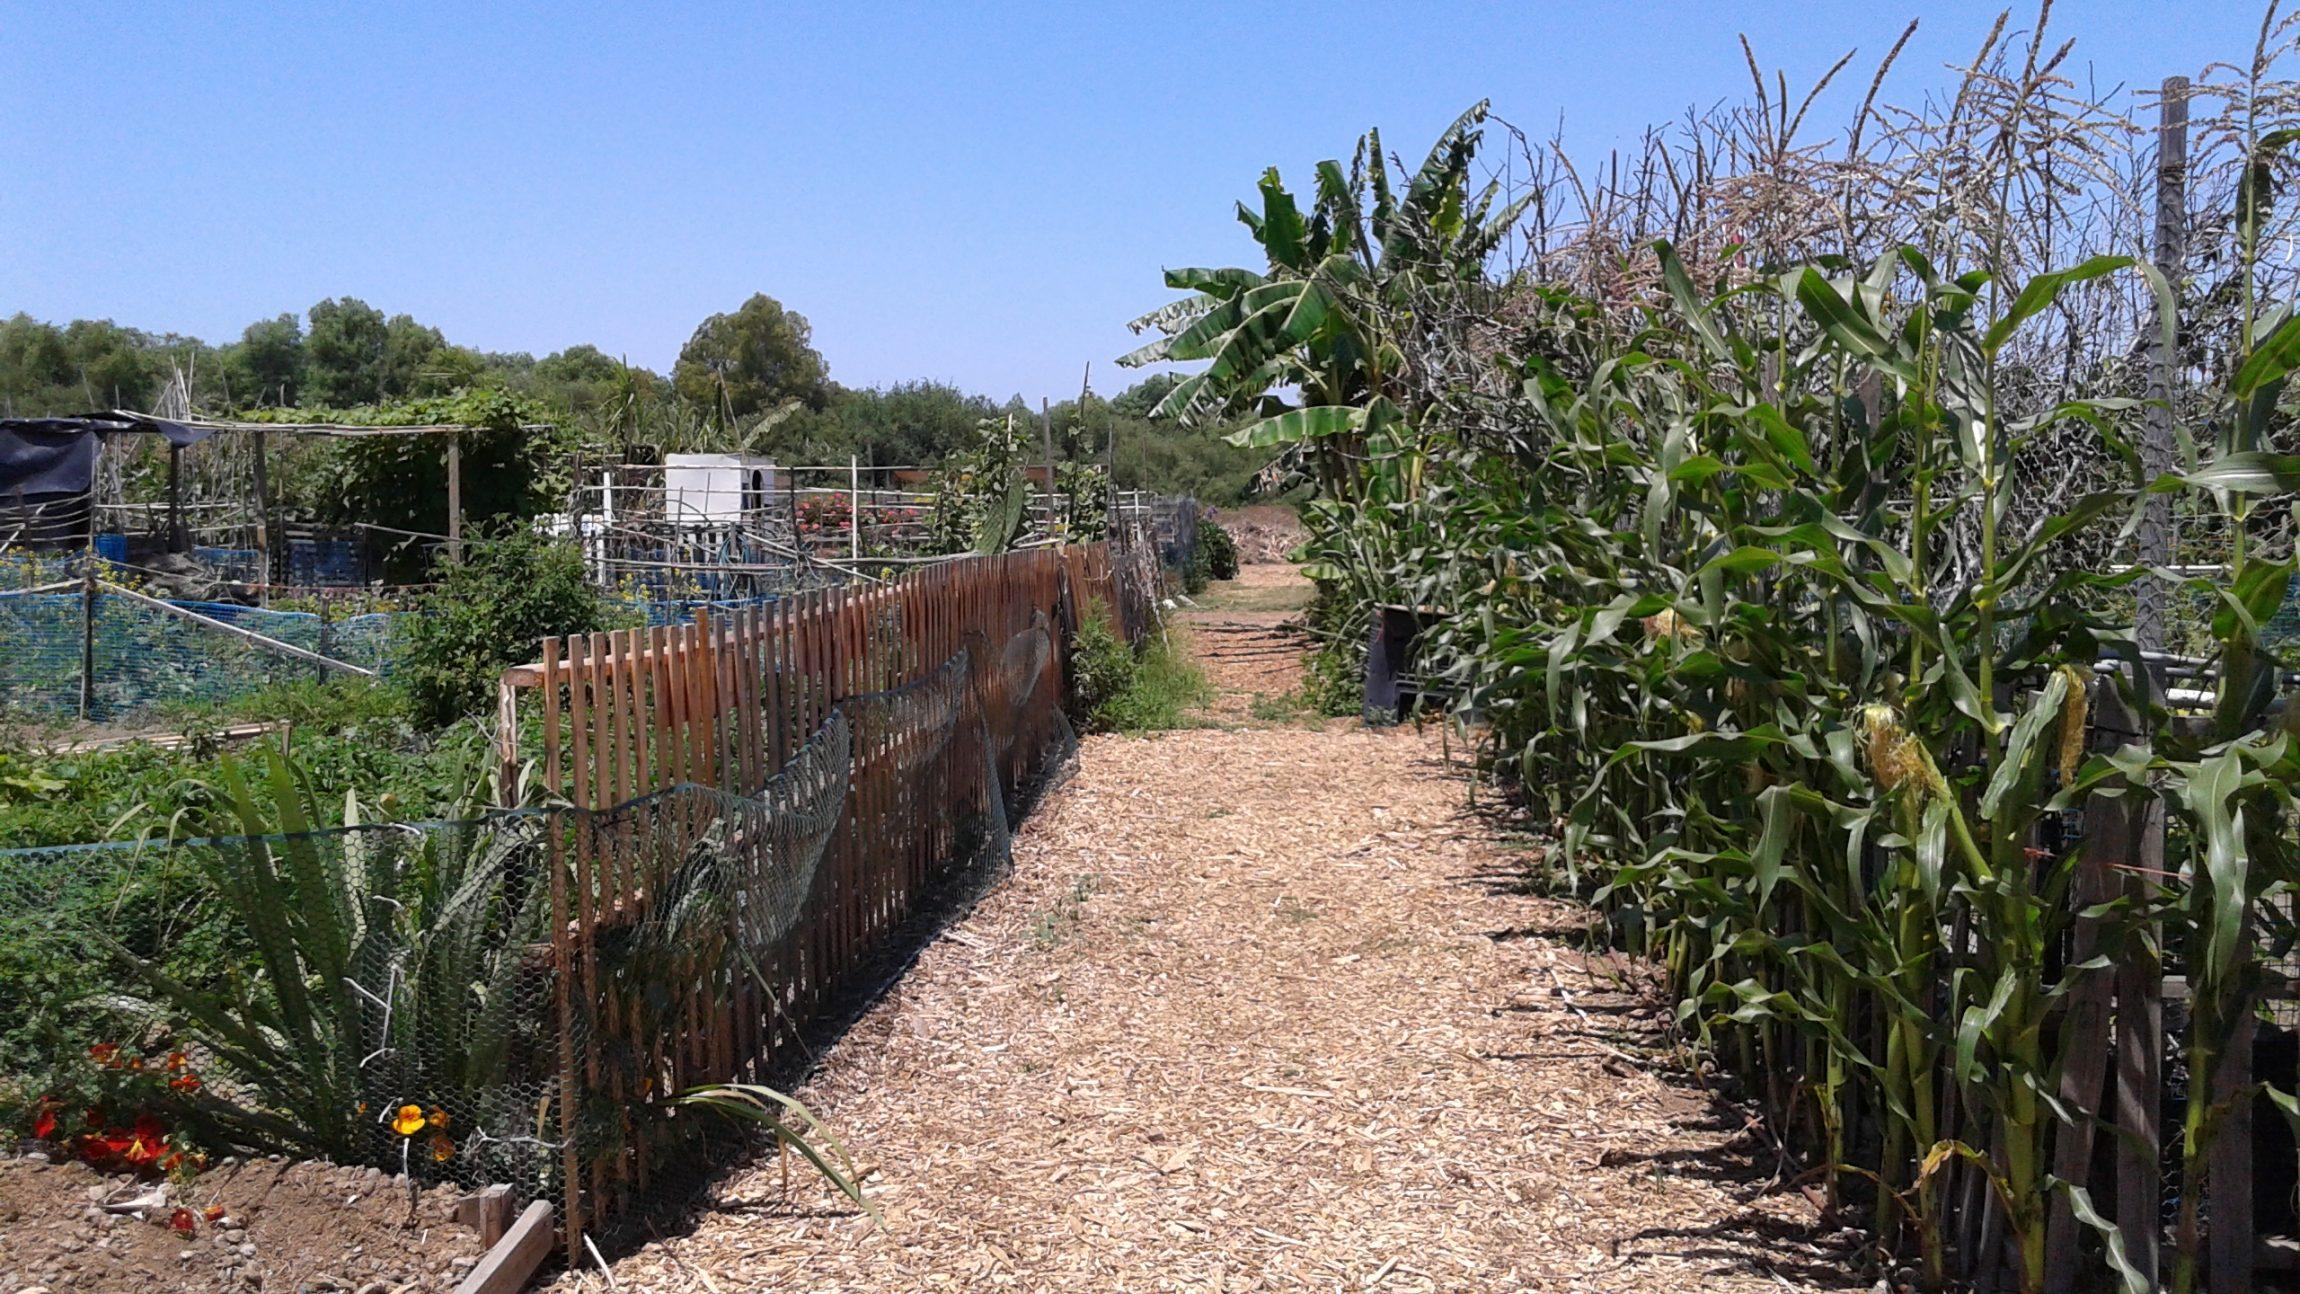 Garden and alley